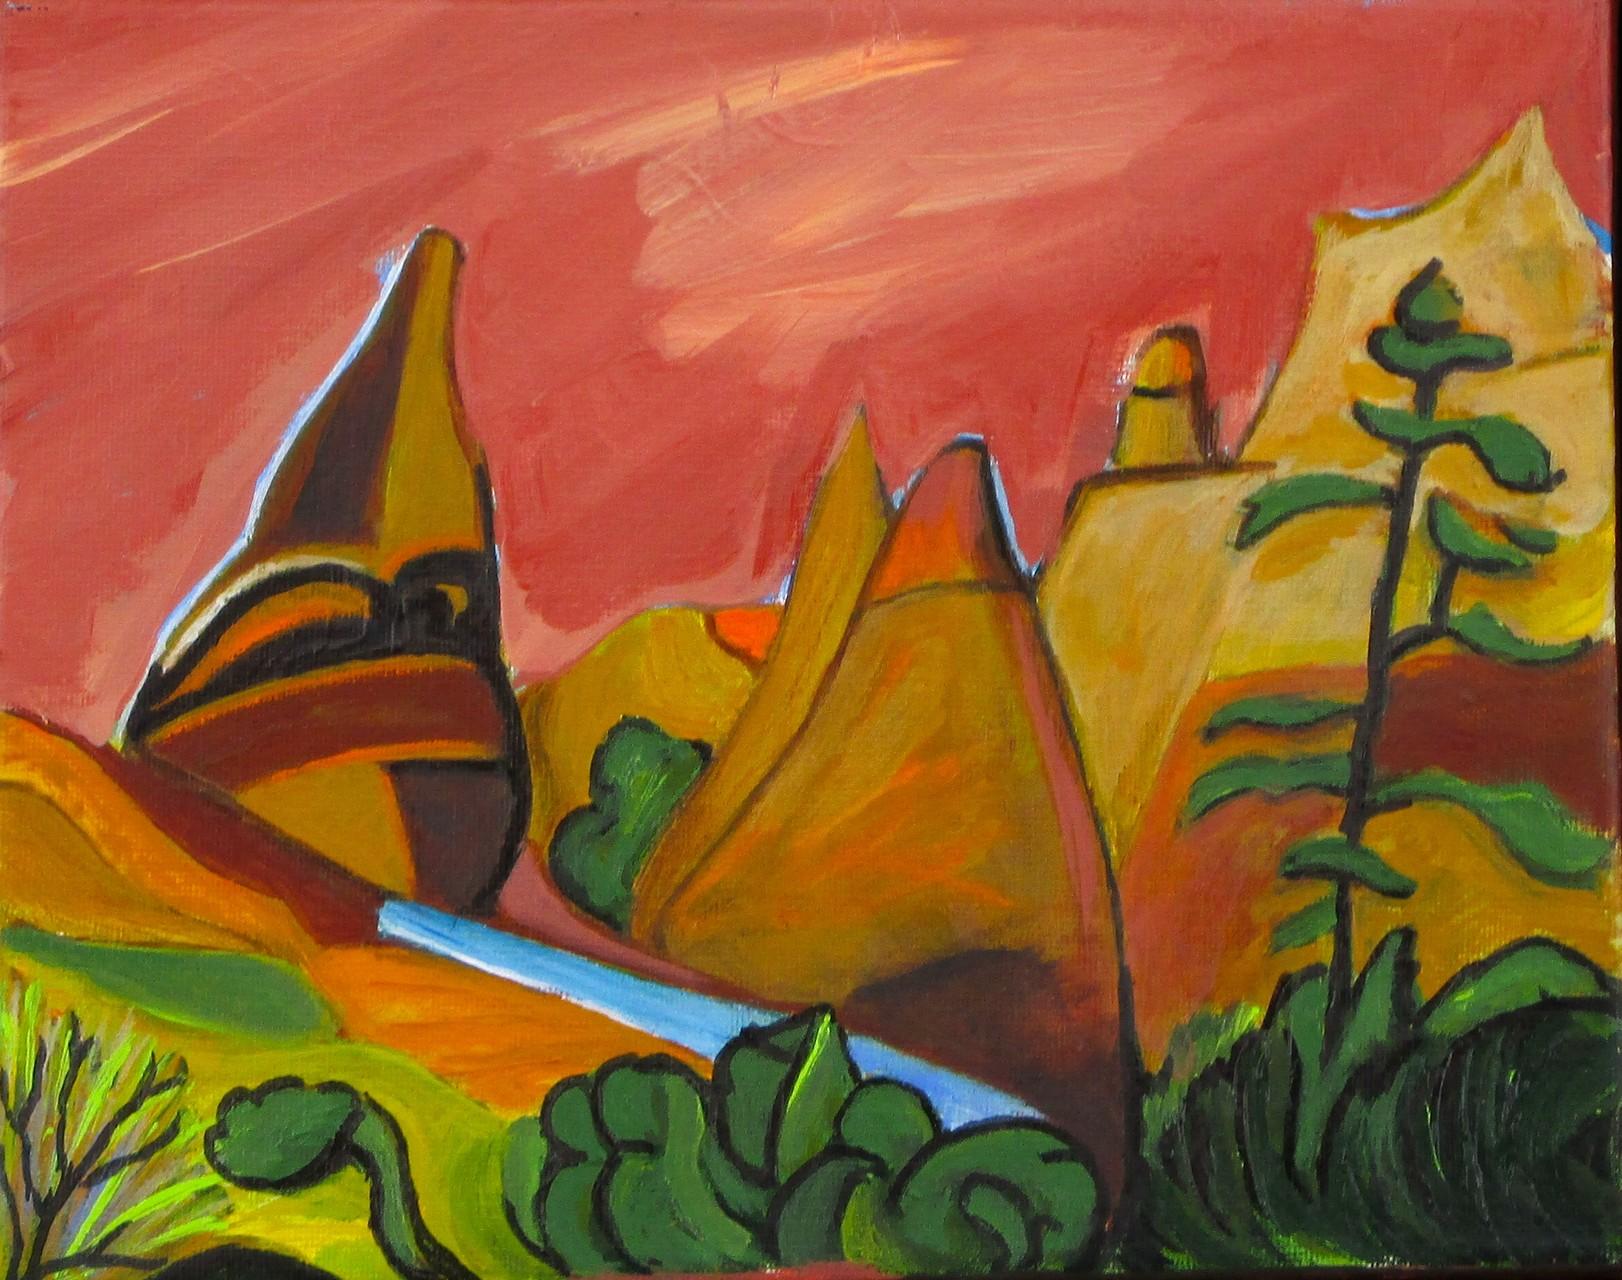 Tent Rocks, oil on canvas, 12 x 9